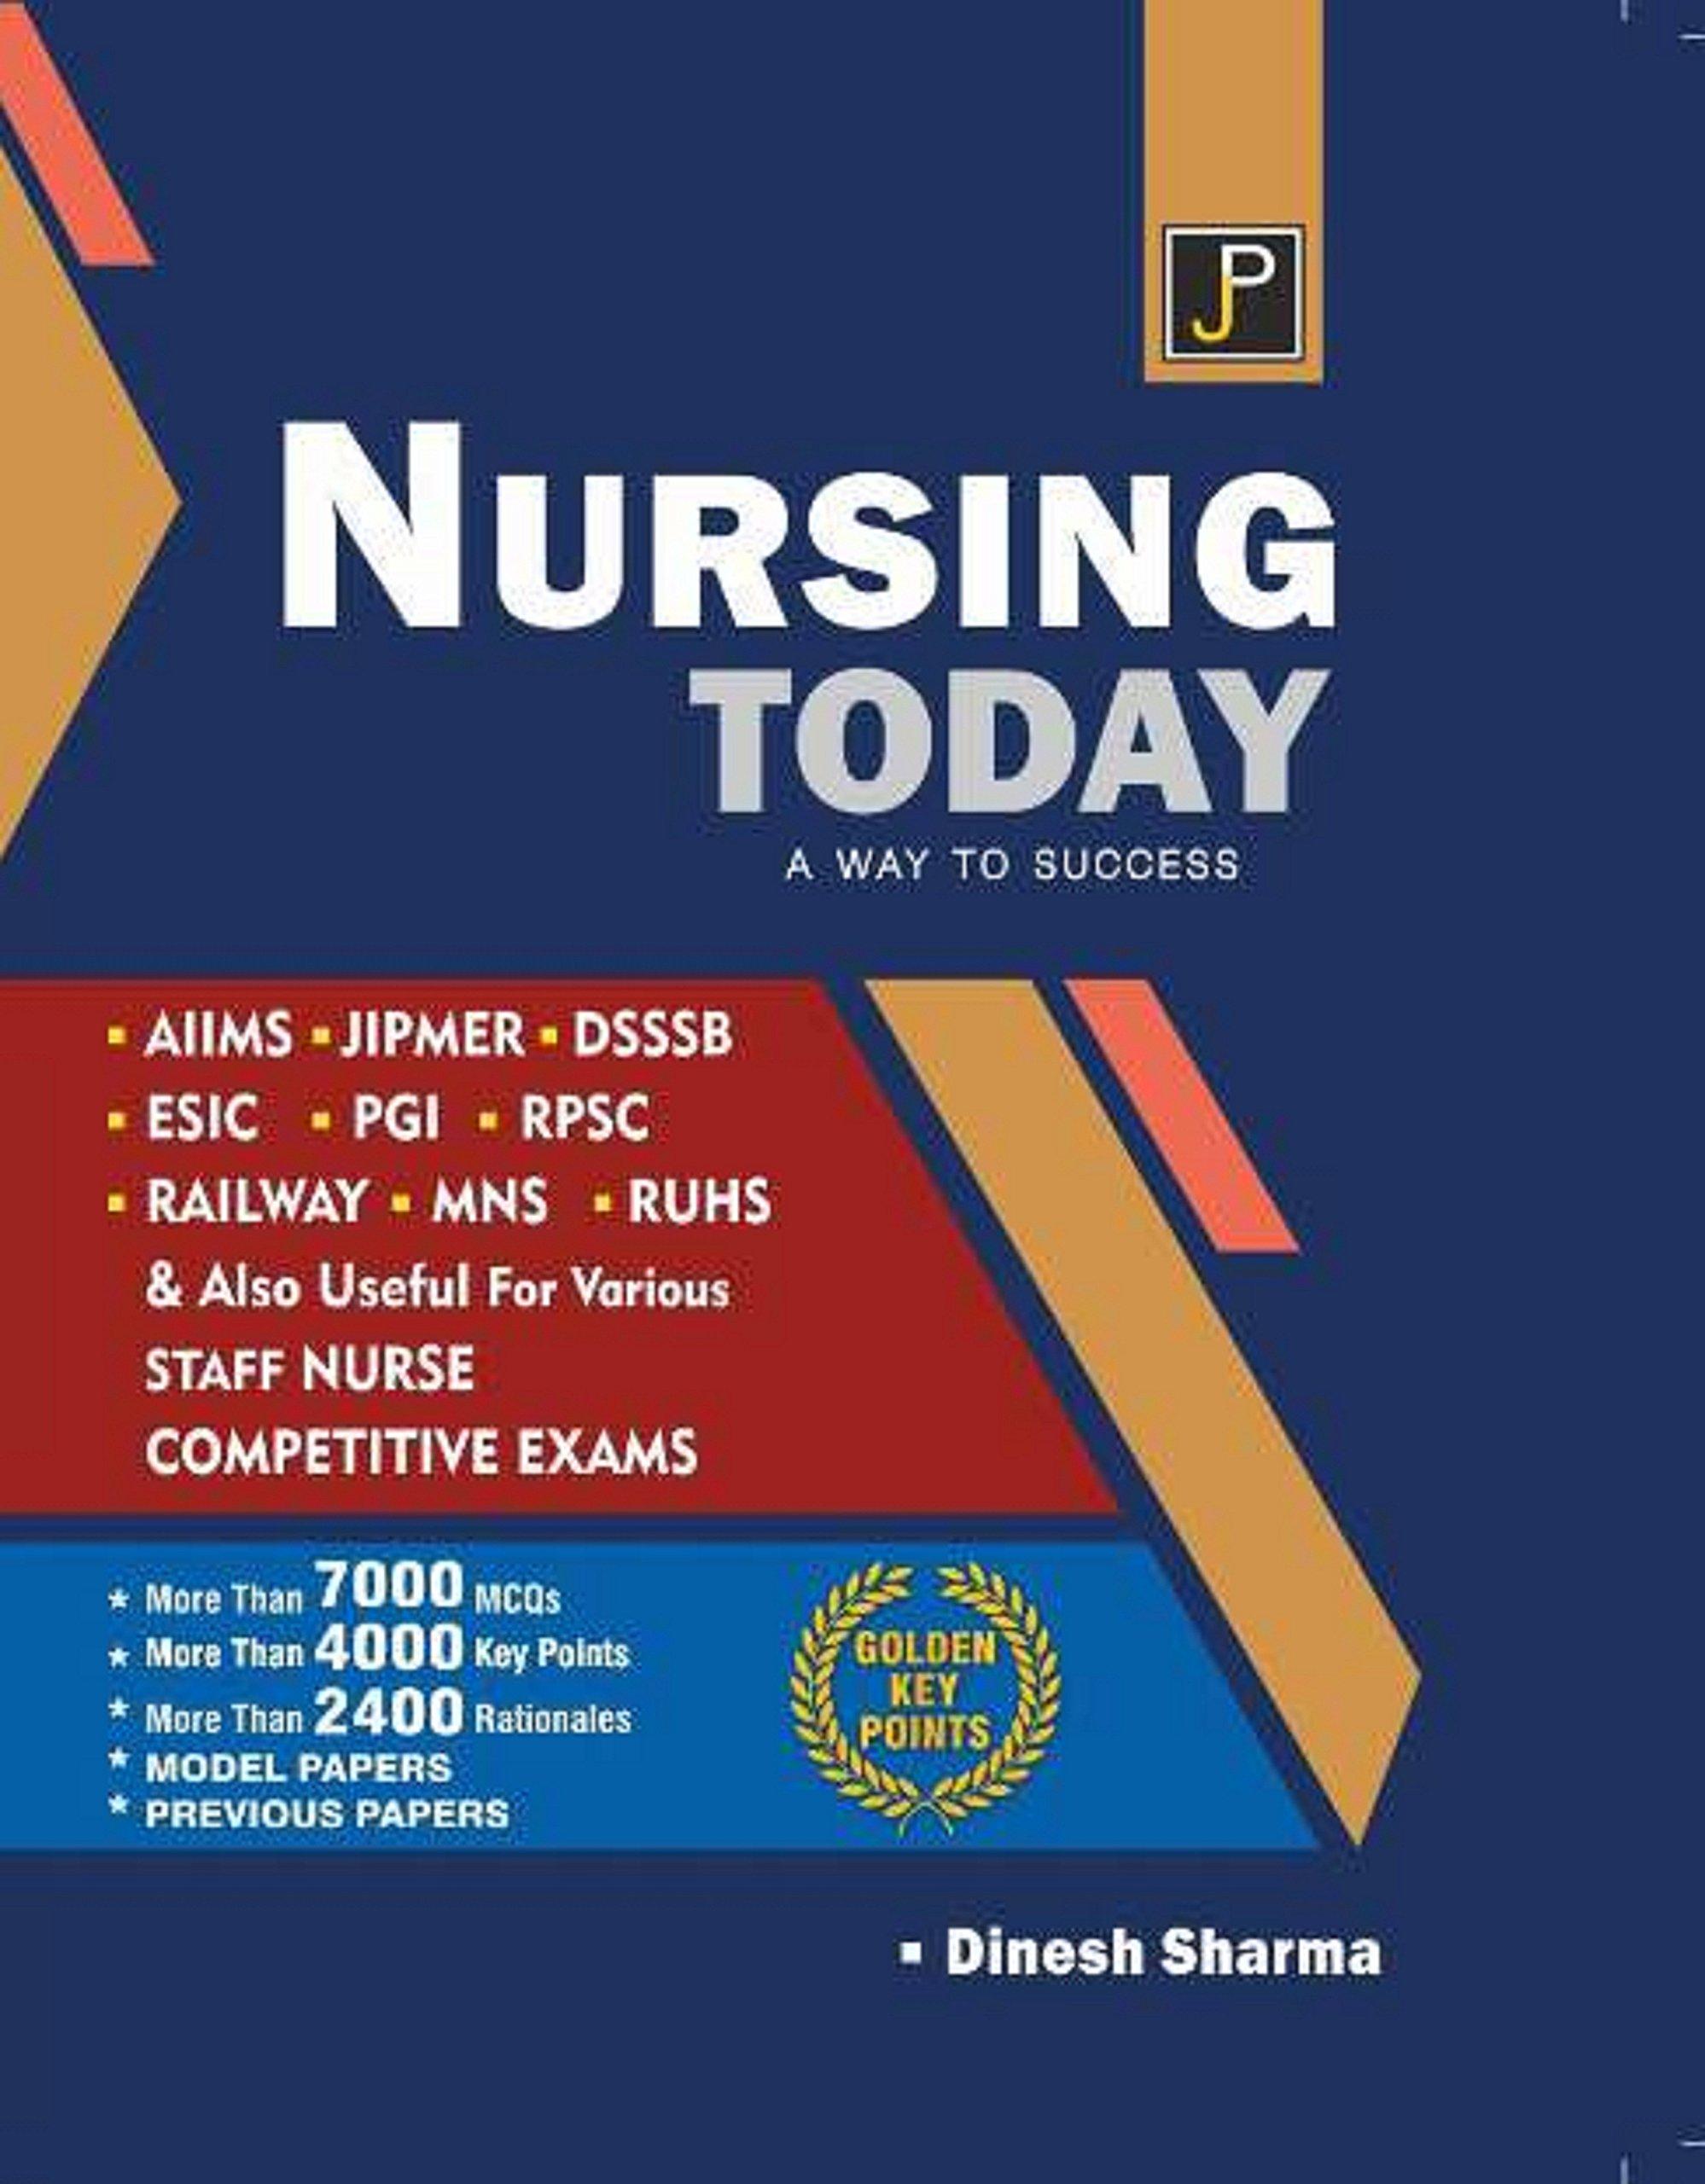 Buy Jp Nursing Today A Way To Success For Aiims Jipmer Dsssb